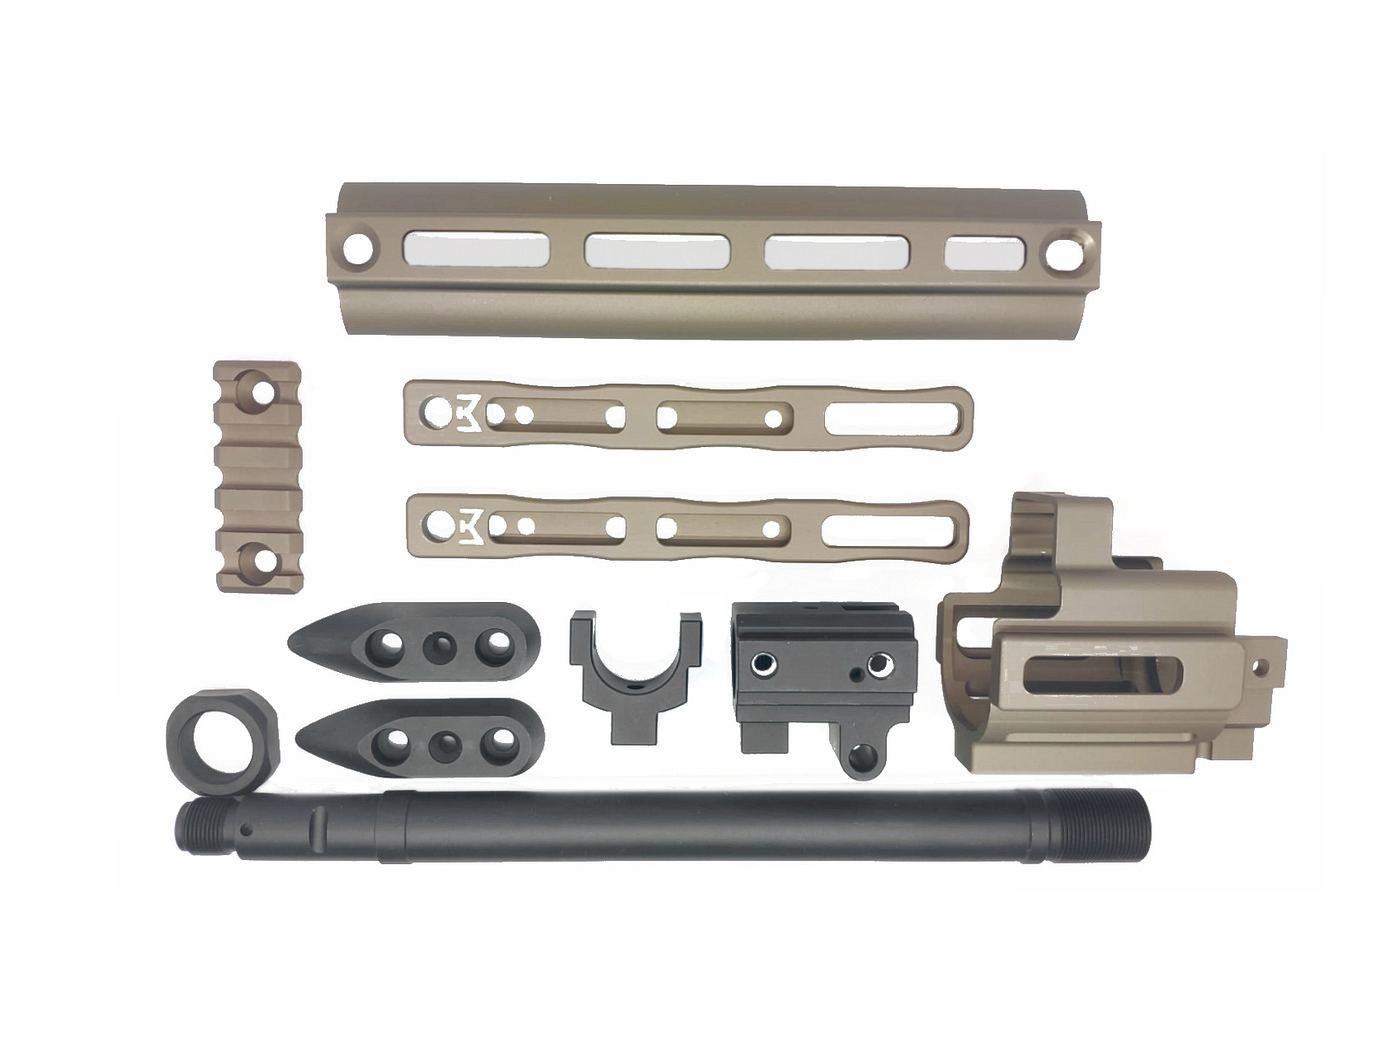 CloneTech PMM型 SCAR M-LOKレイルアダプター/エクステンションキット DX (WE SCAR GBB対応) BK/FDE